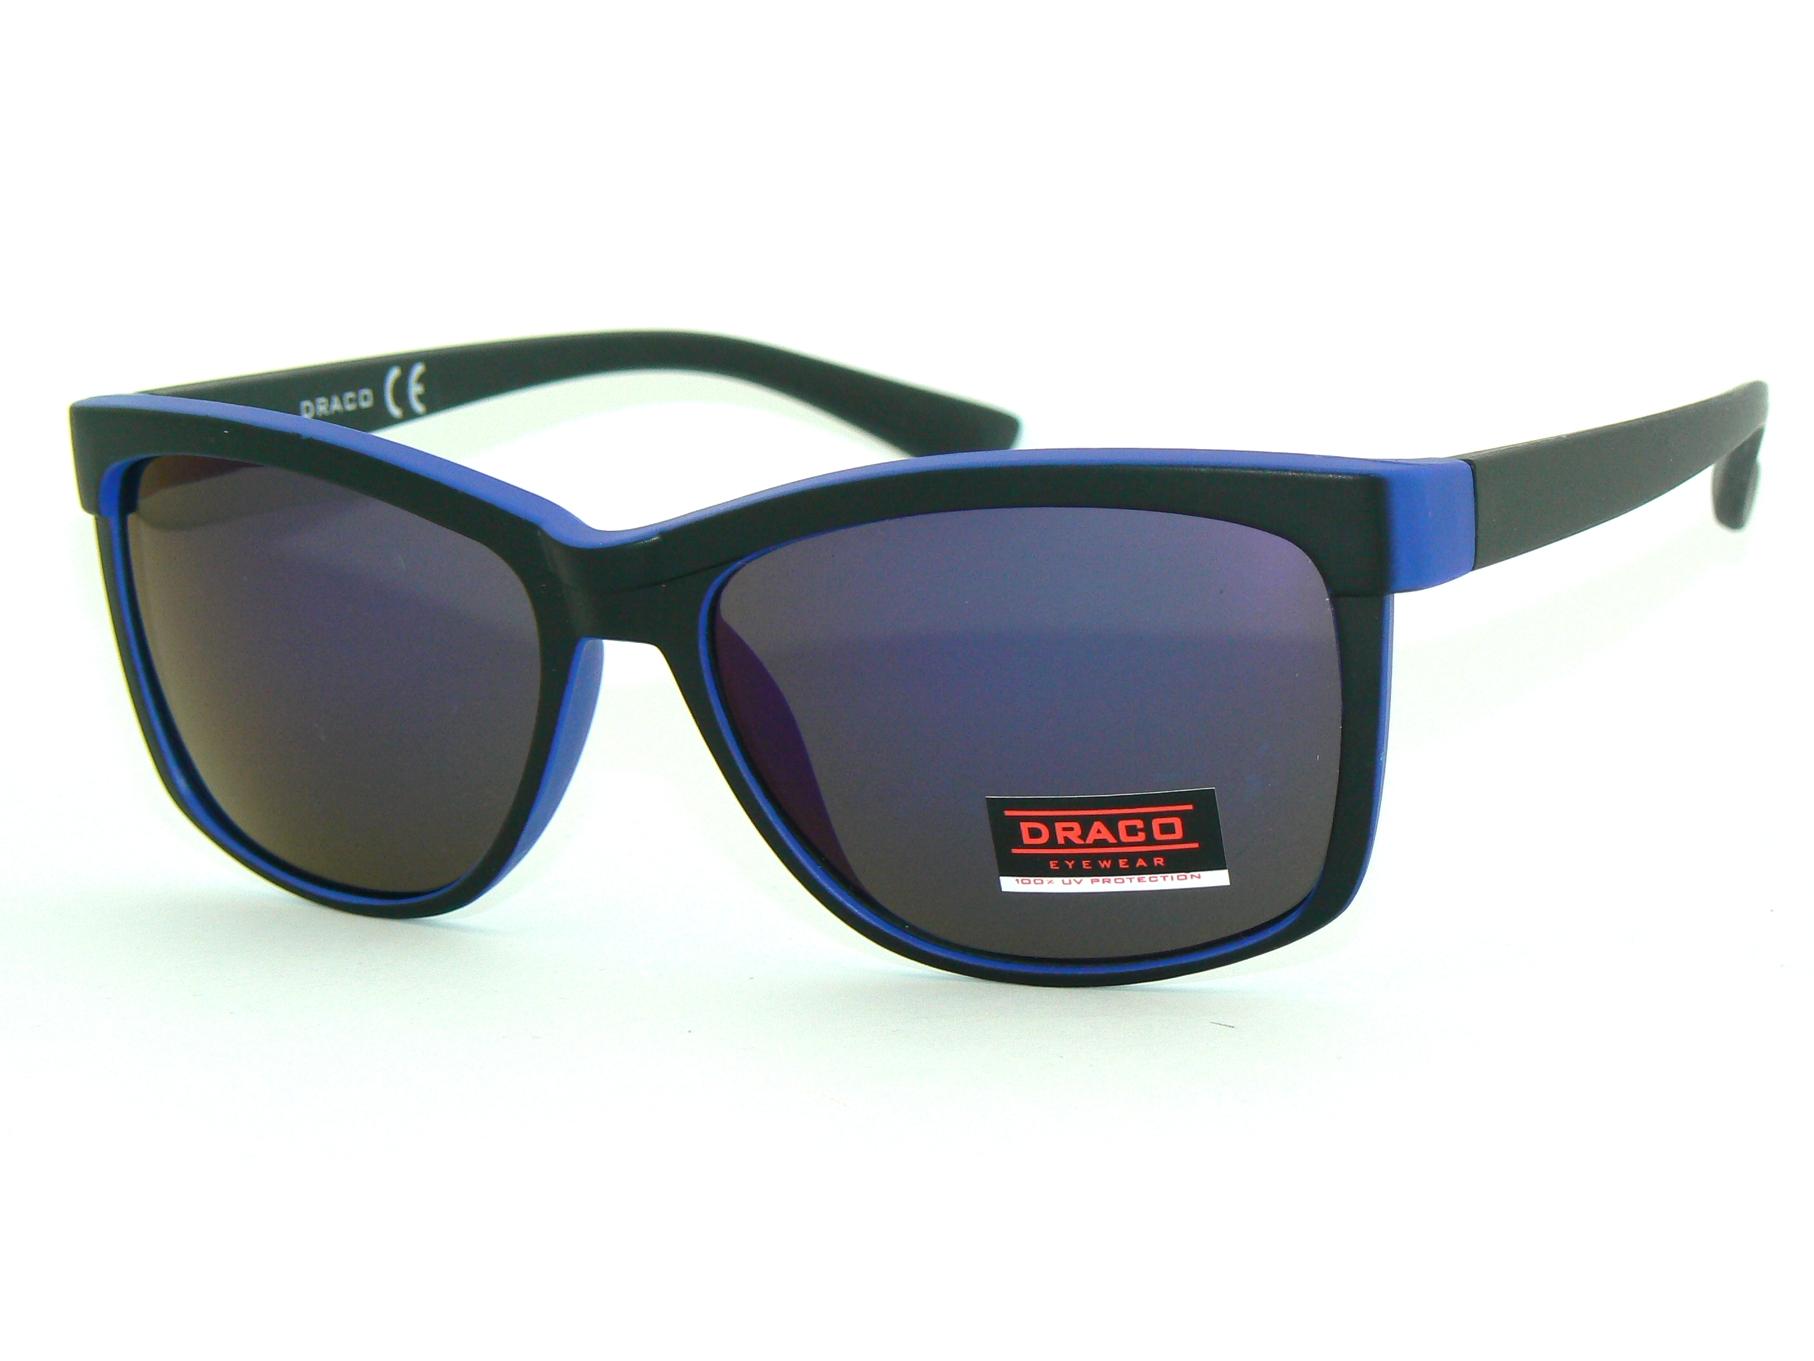 d1d79a55c4ea MODNE słoneczne OKULARY nerdy UV lustra DRACO mat - 7136680353 ...